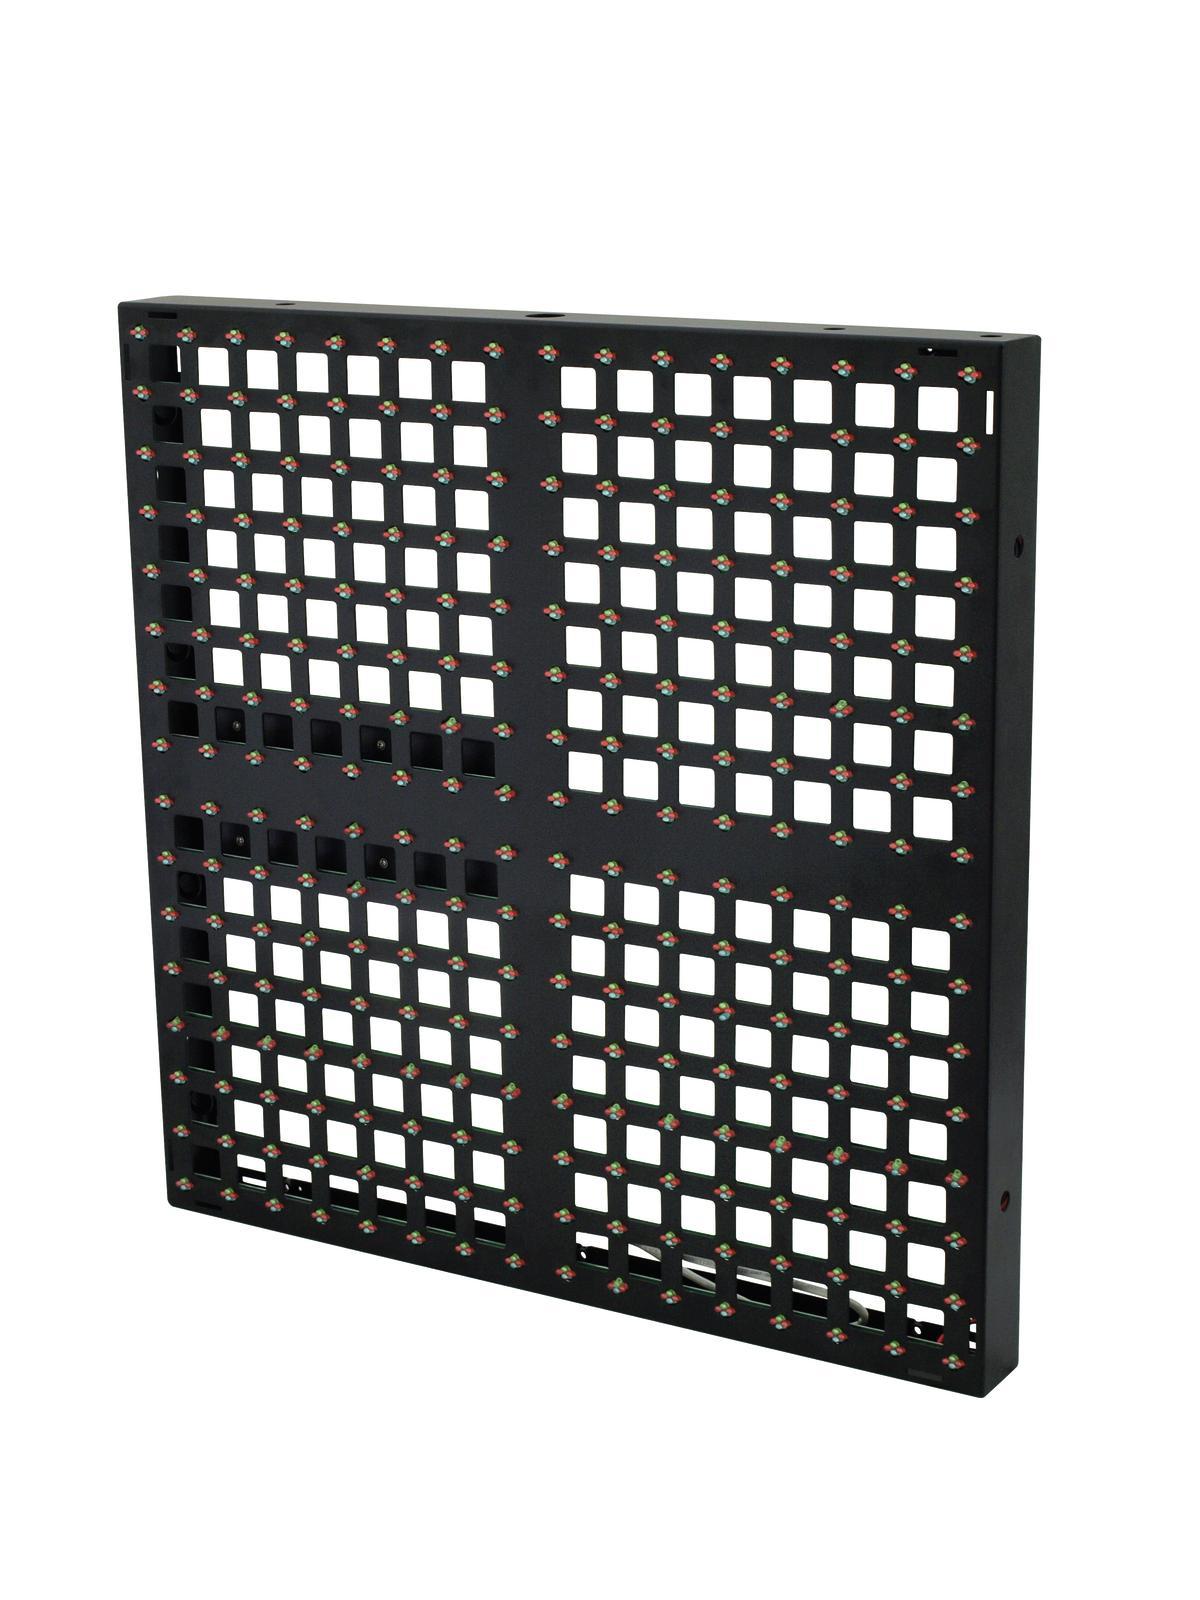 EUROLITE LED Pixel Maglia 64x6